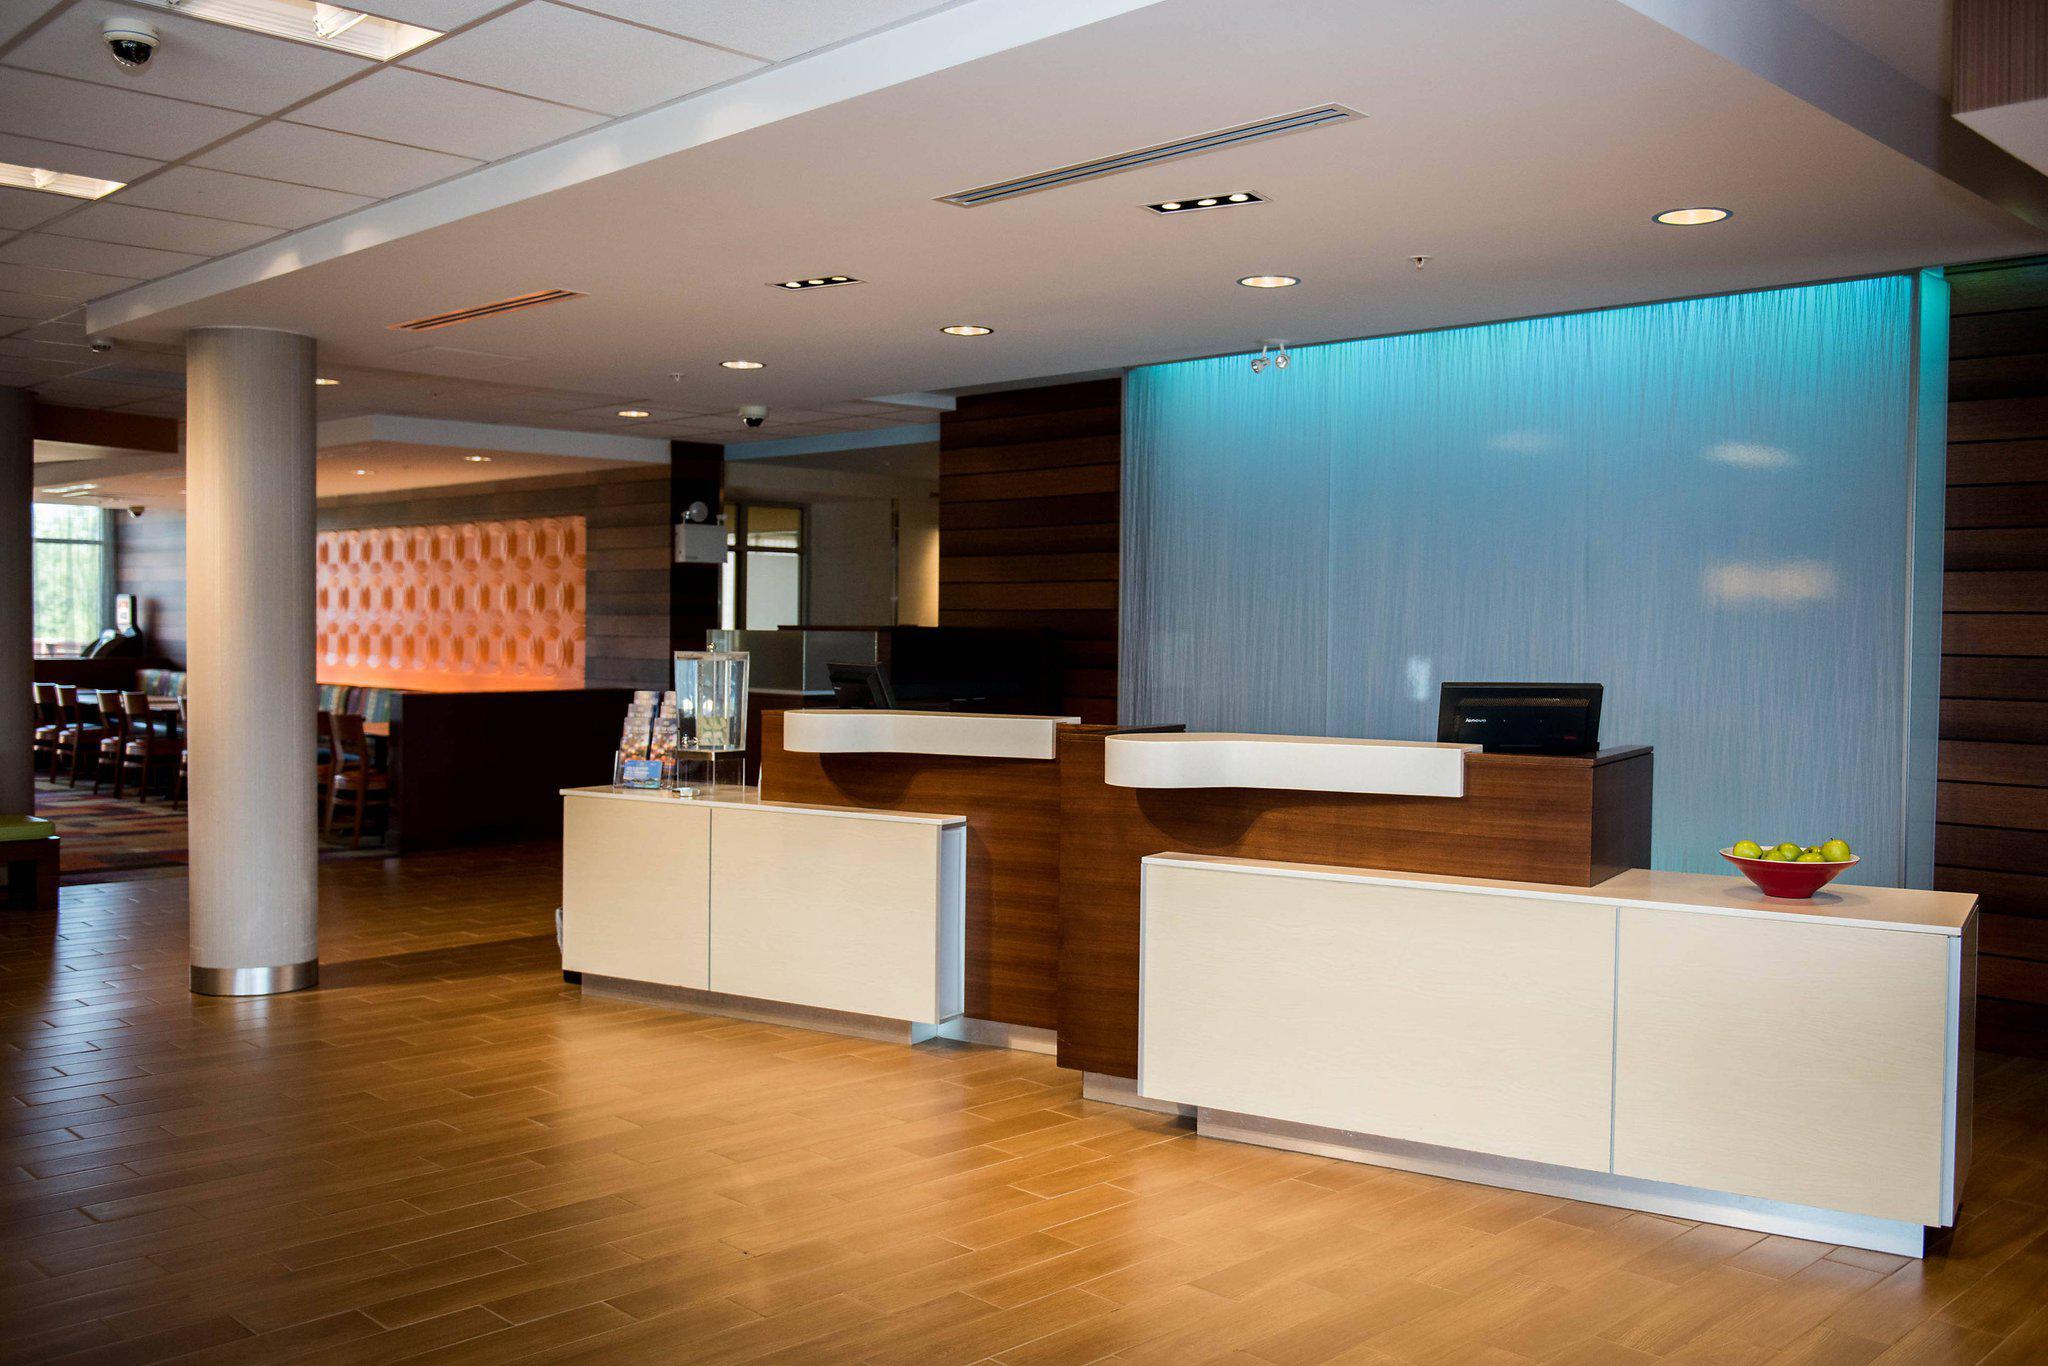 Fairfield Inn & Suites by Marriott Moncton